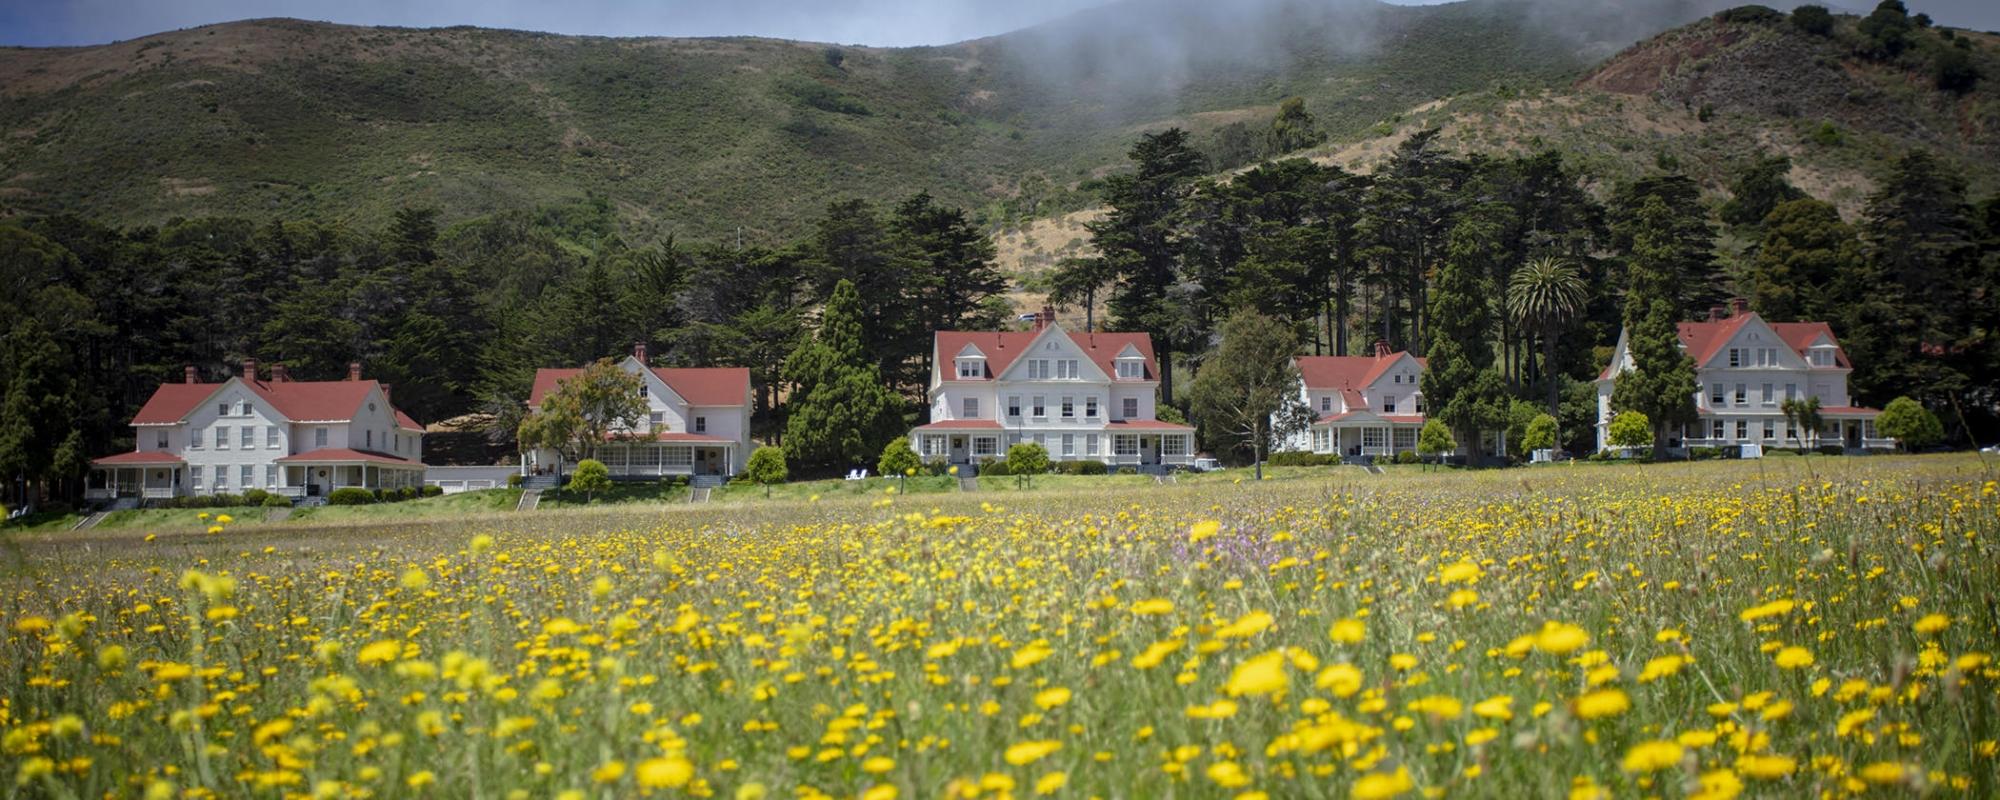 Luxury Ada San Francisco Bay Area Resort Cavallo Point